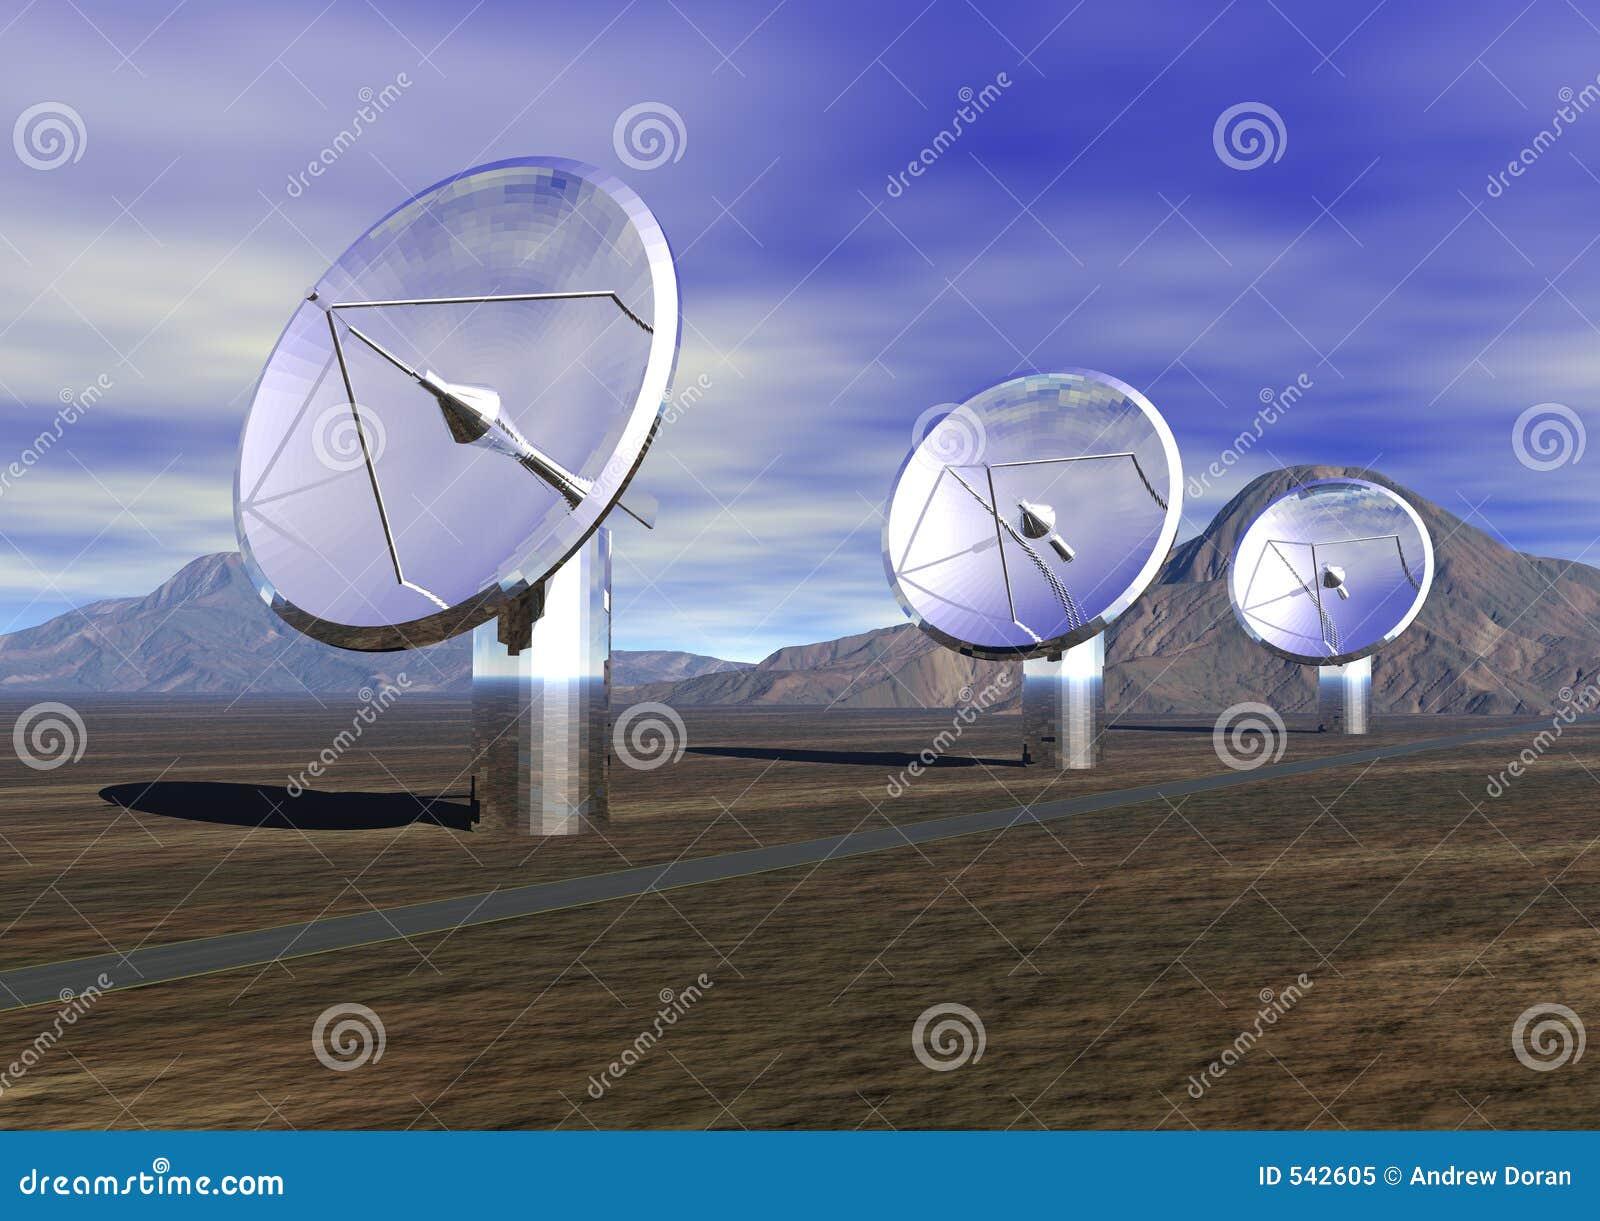 Download 断送卫星 库存图片. 图片 包括有 扫描程序, 连接数, 传输, 通信, 卫星, 扫描, 及早, 沟通, 数字式 - 542605